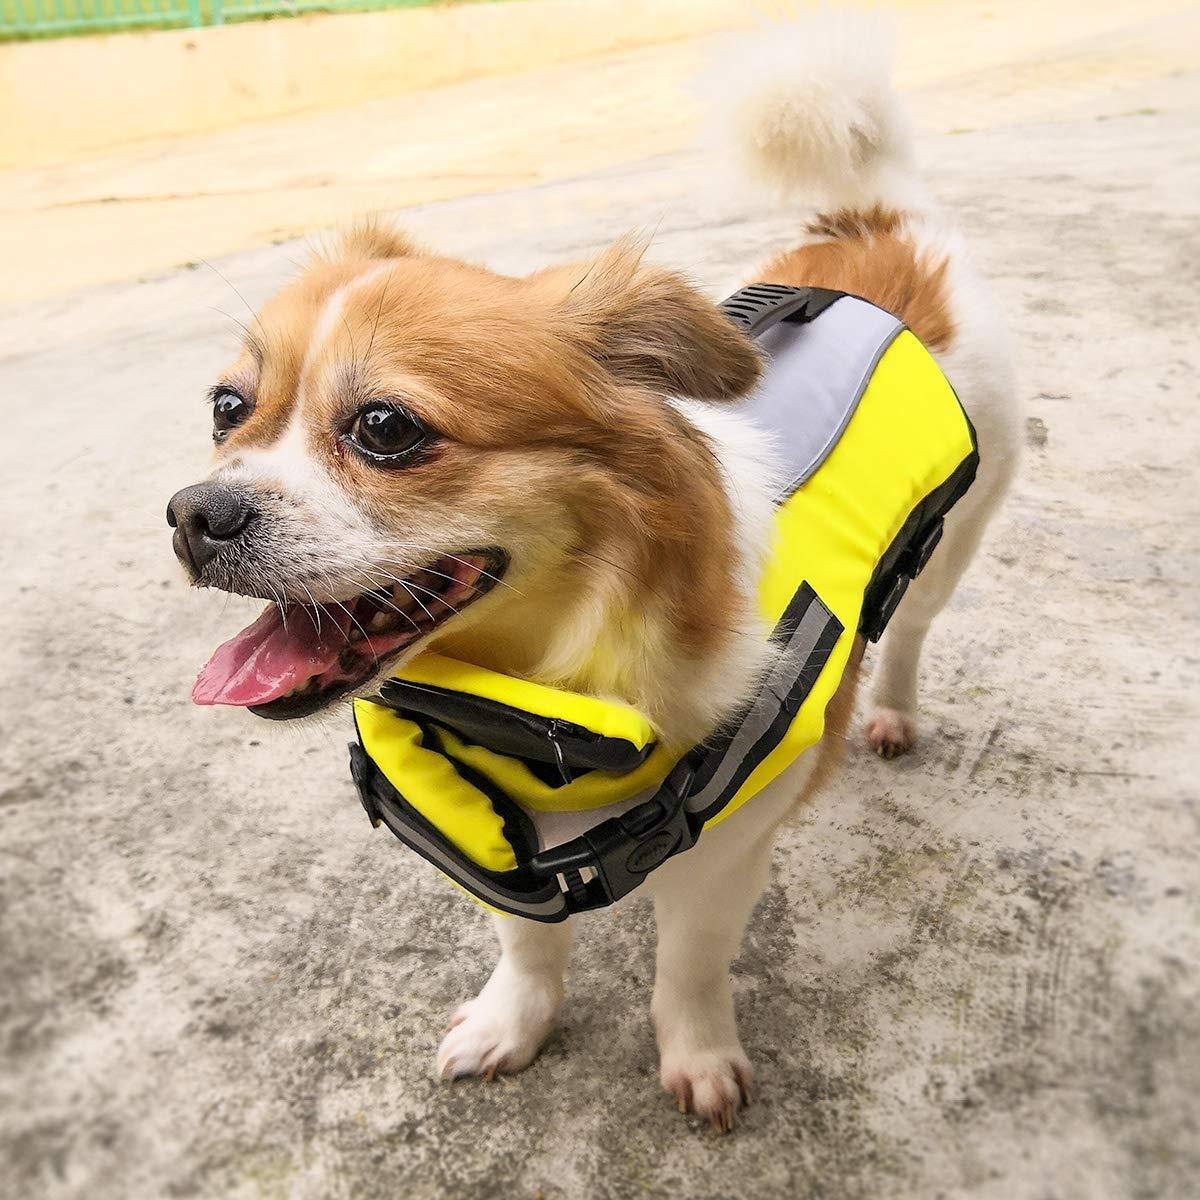 43454fcf4efe5 Small Raincoat Dog Life Jacket, Foldable Adjustable Pet Vest Safety ...